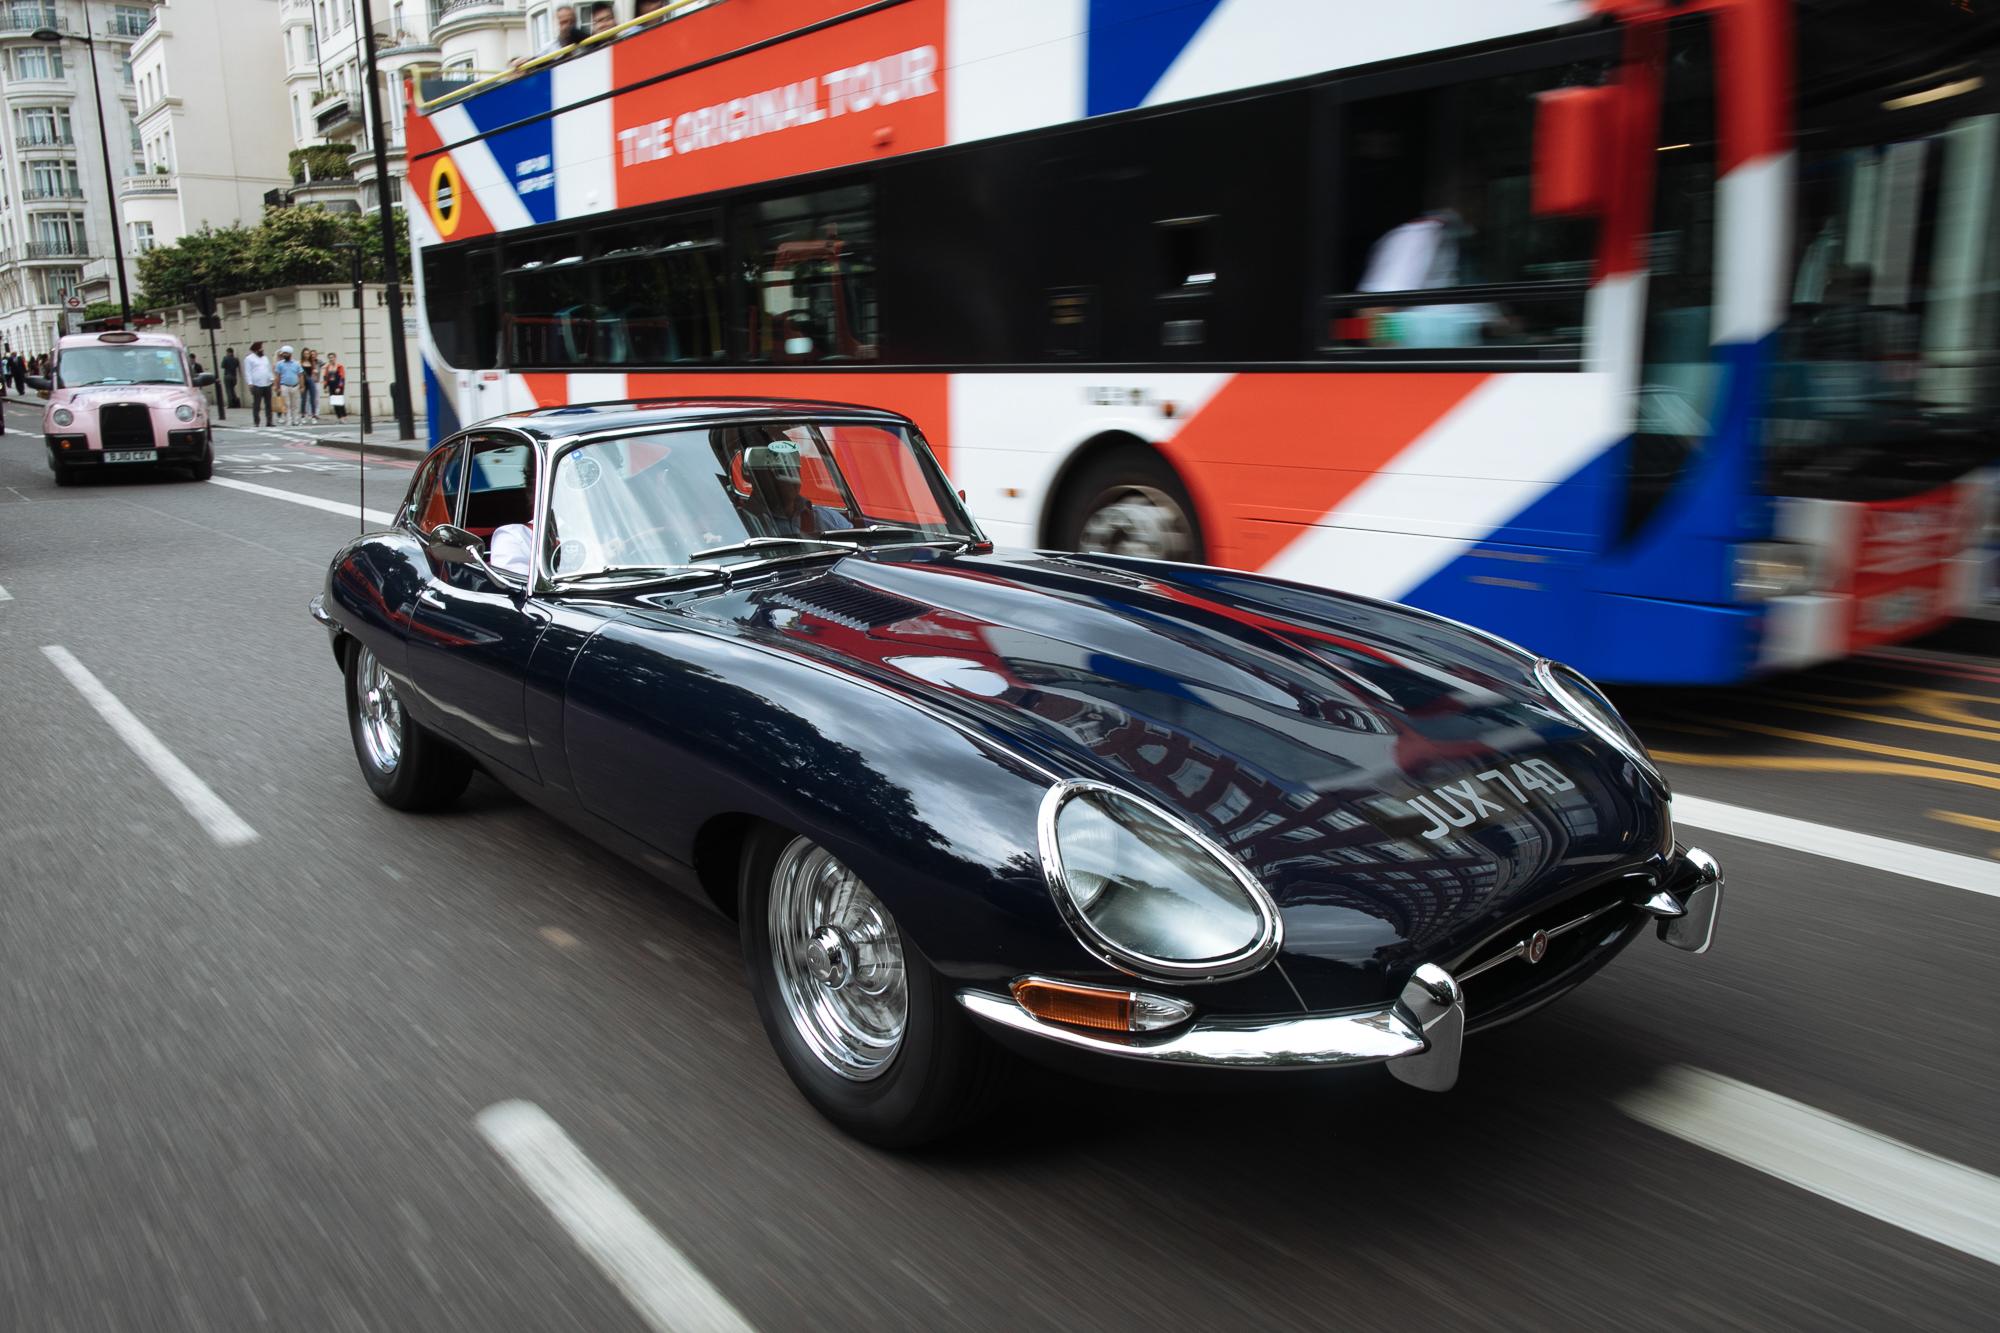 Gideon_Lang_Laddie_Gideons_Agency_Roadshow_London_Events_Photographer-41.jpg